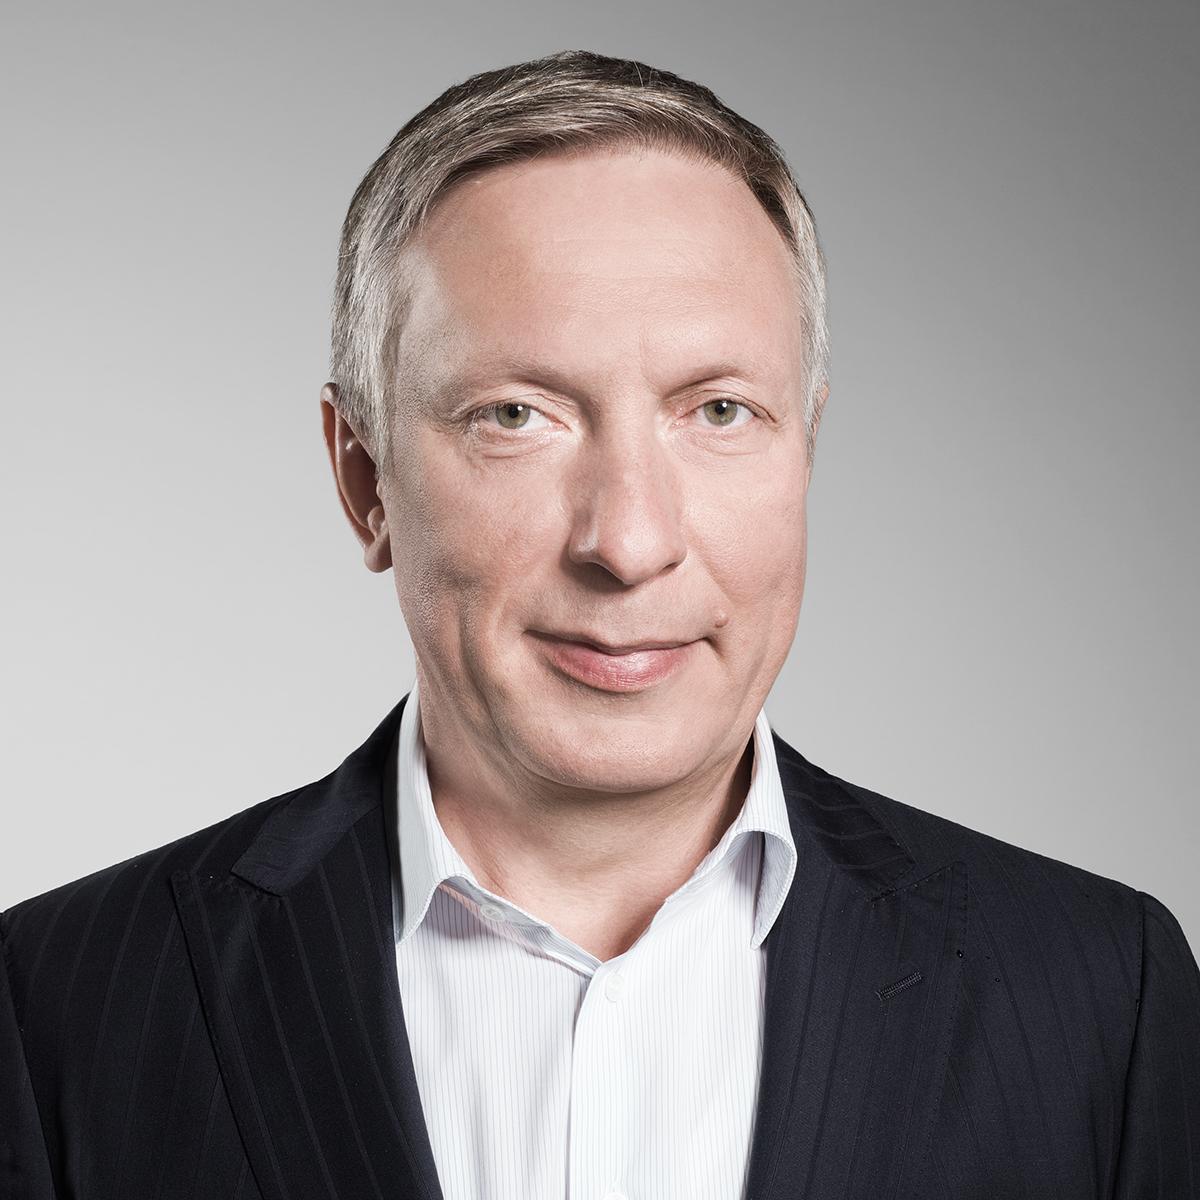 Headshot of Veeam's Ratmir Timashev